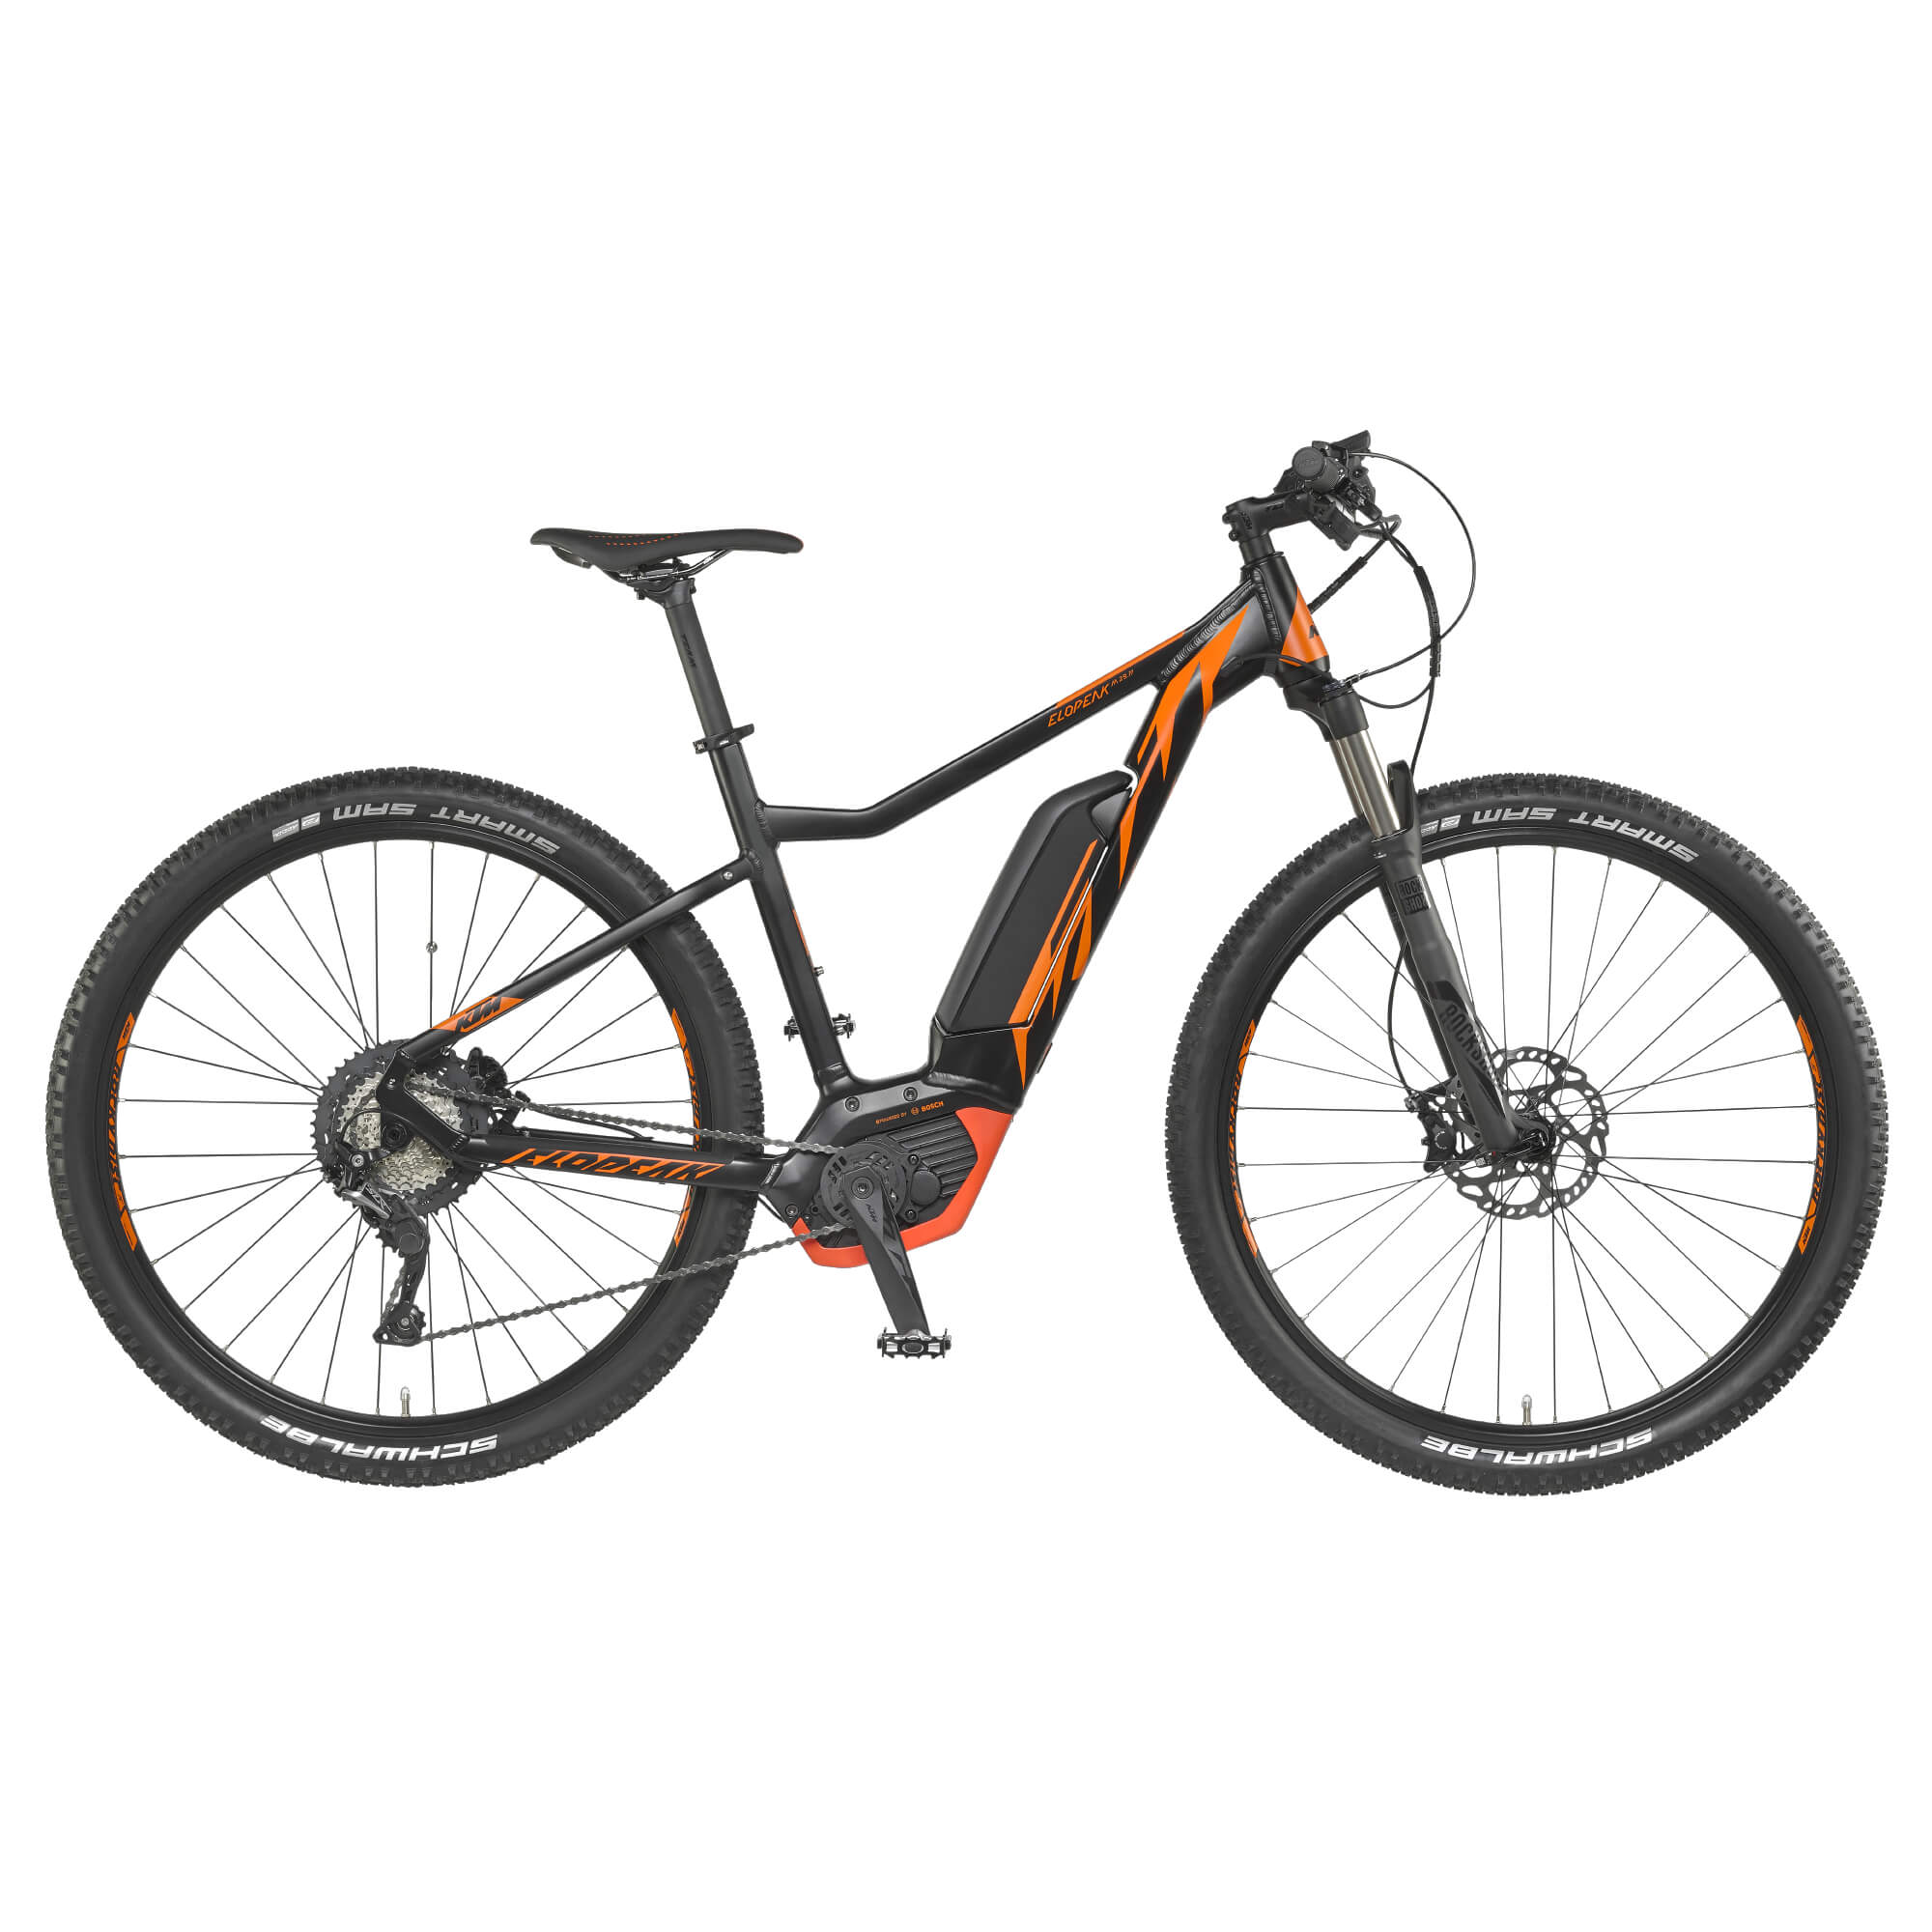 Elopeak Biciclete E-Bikes KTM